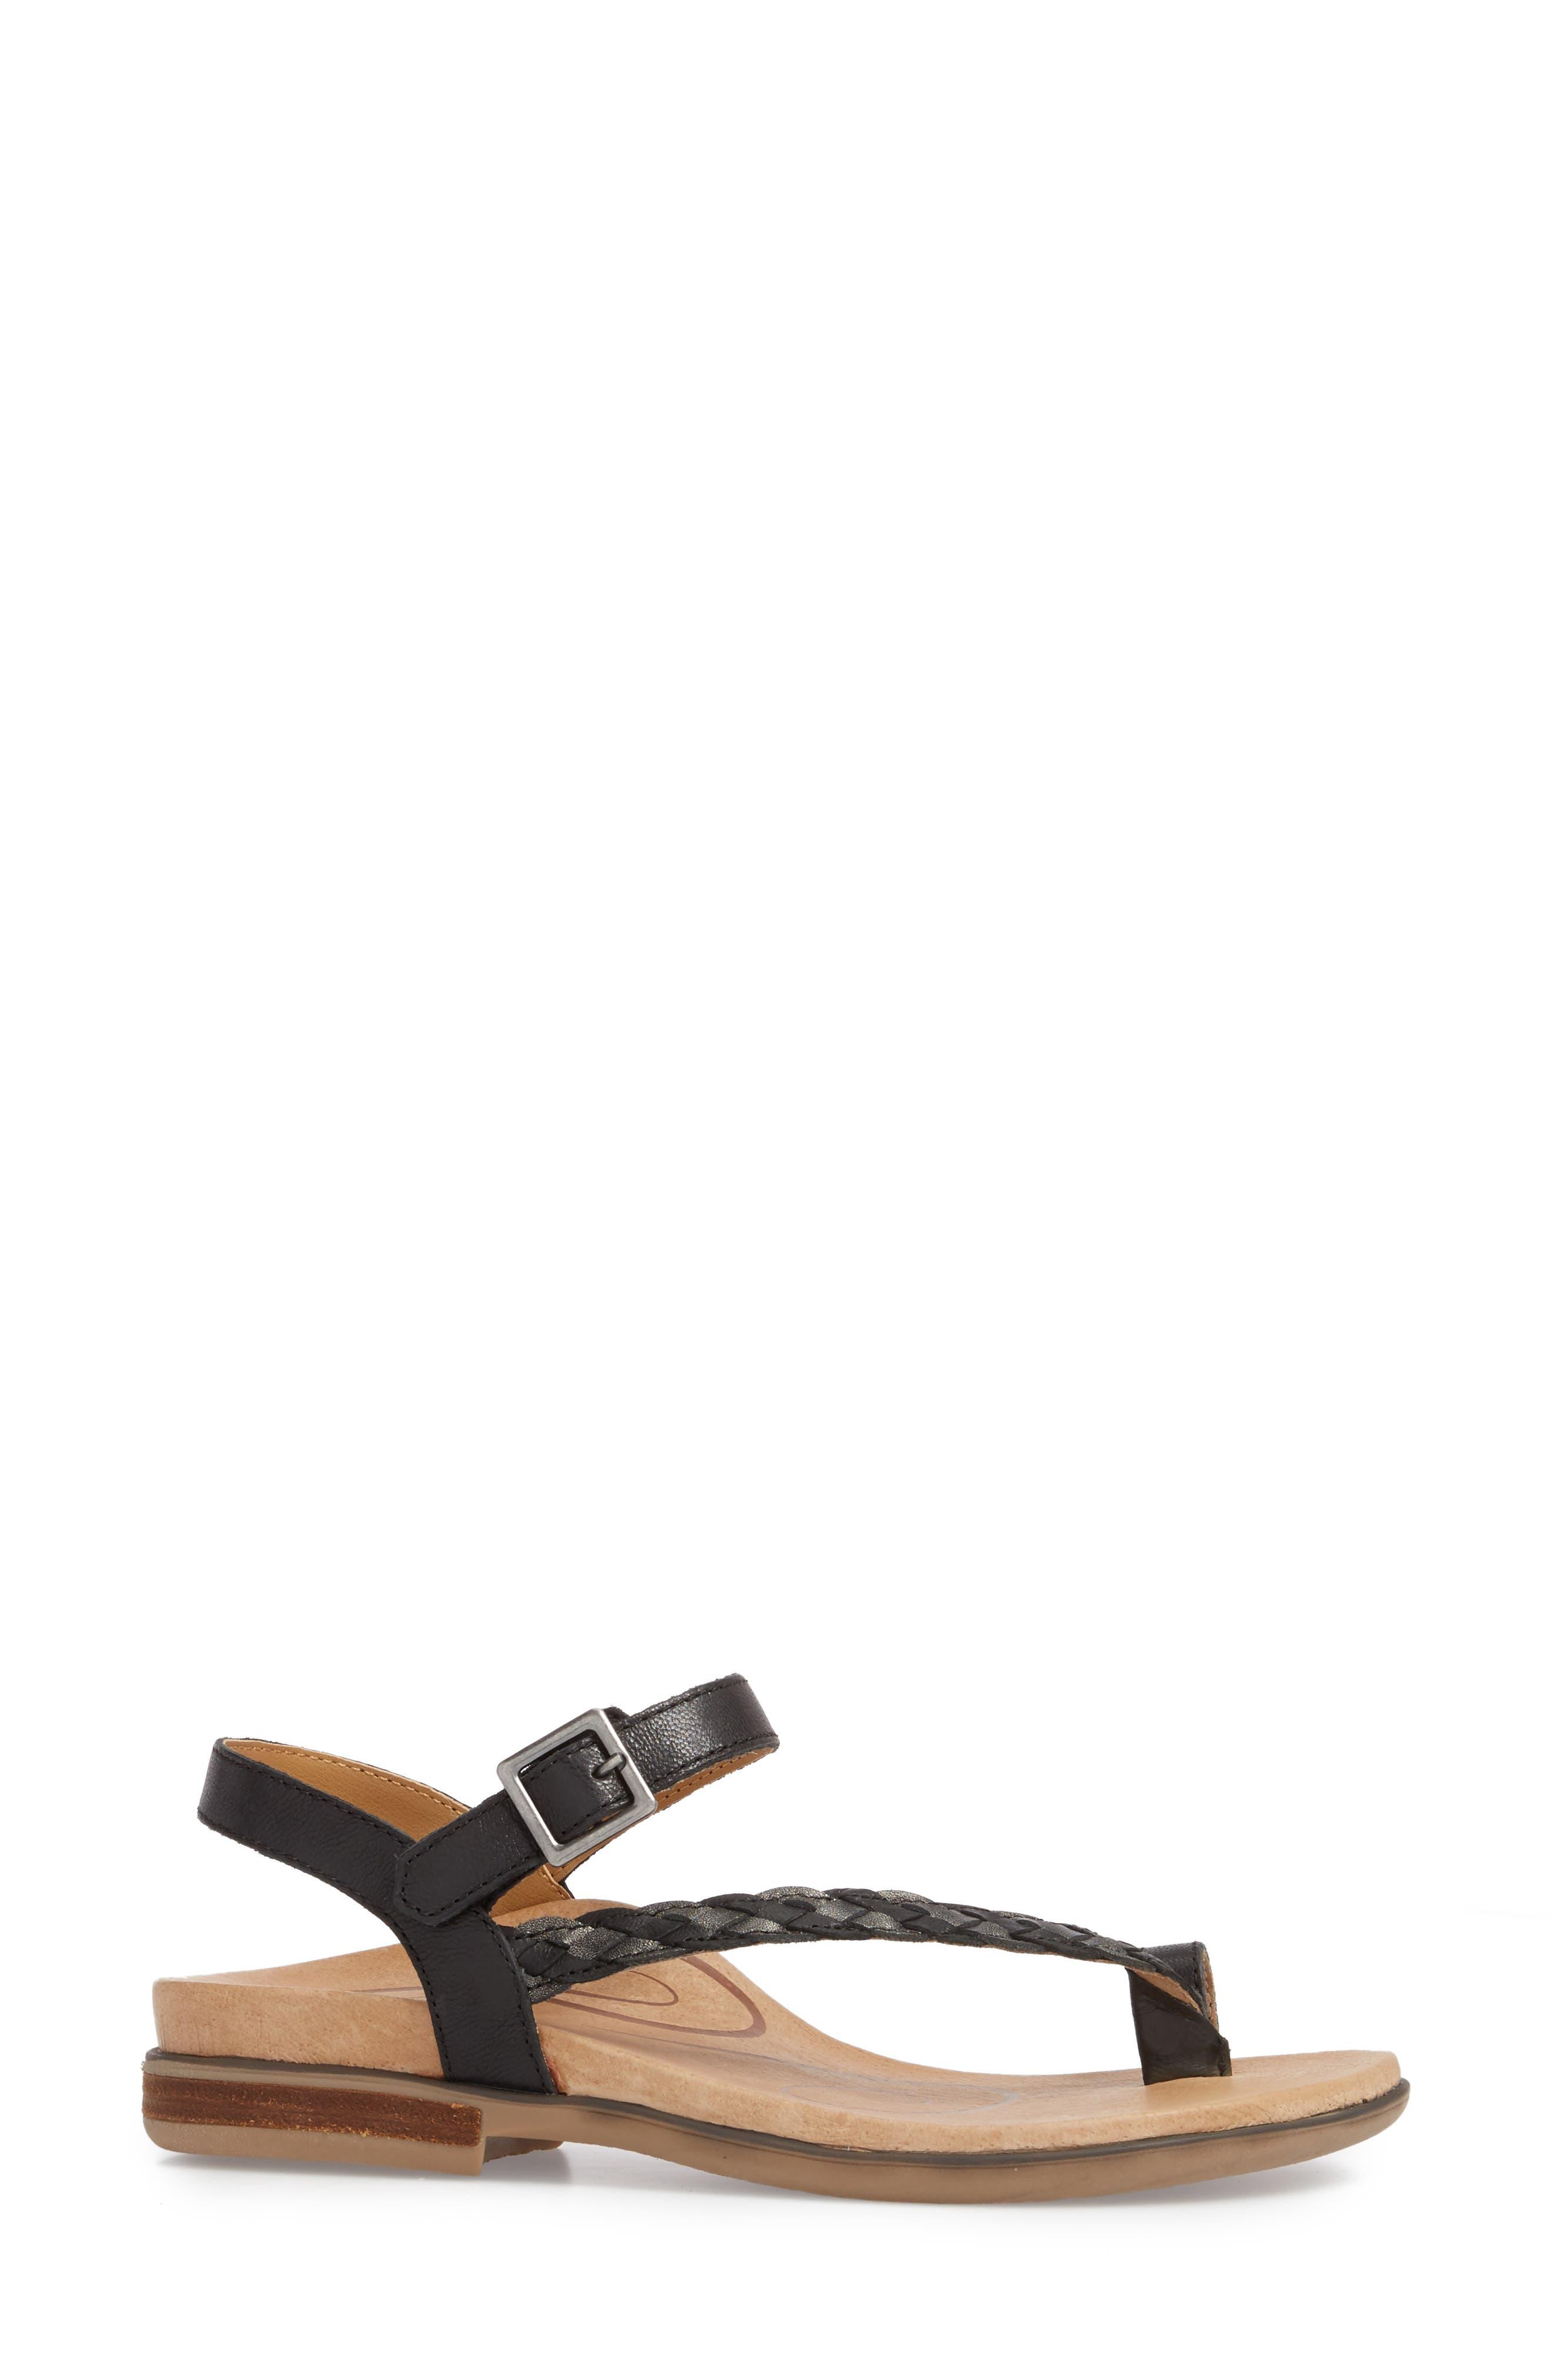 AETREX, Evie Braided Strap Sandal, Alternate thumbnail 3, color, BLACK LEATHER